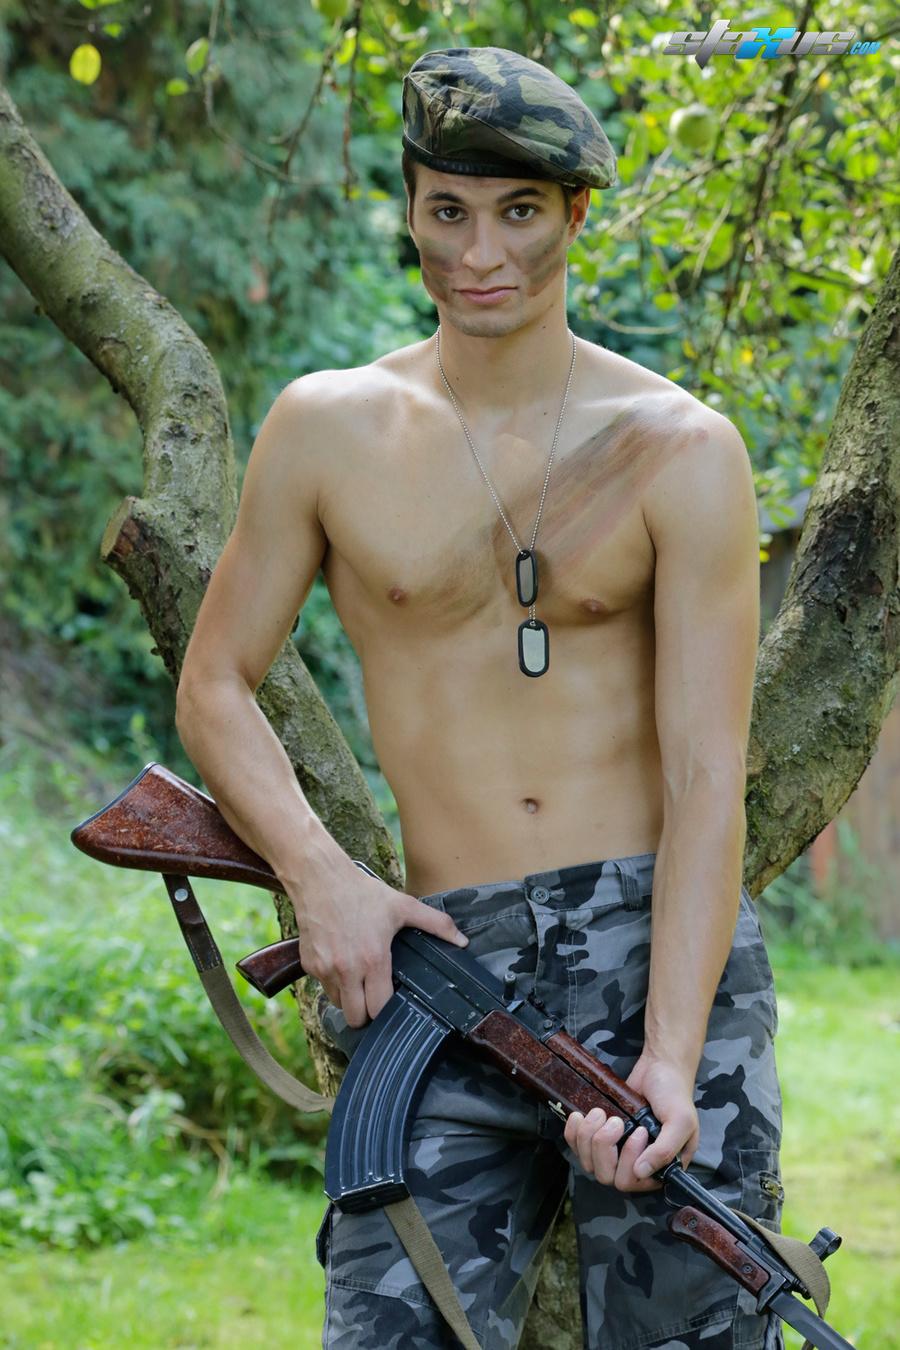 asian cheap escort gay military